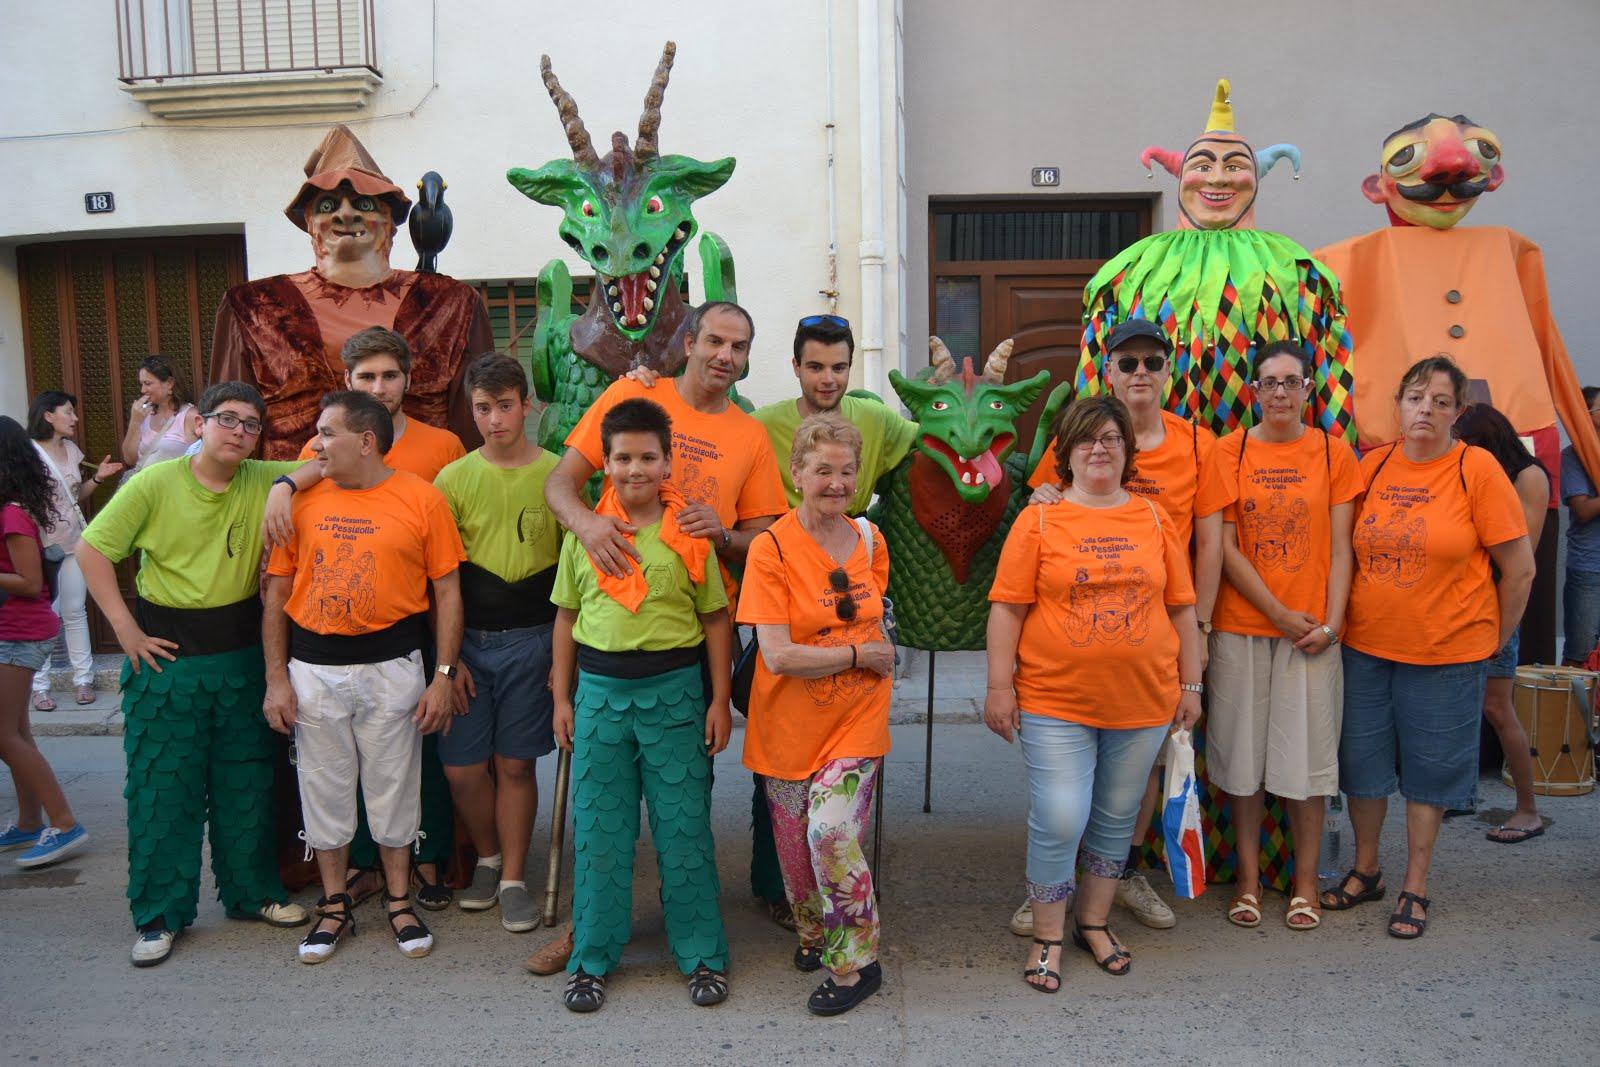 VIII Trobada de gegants a Torregrossa